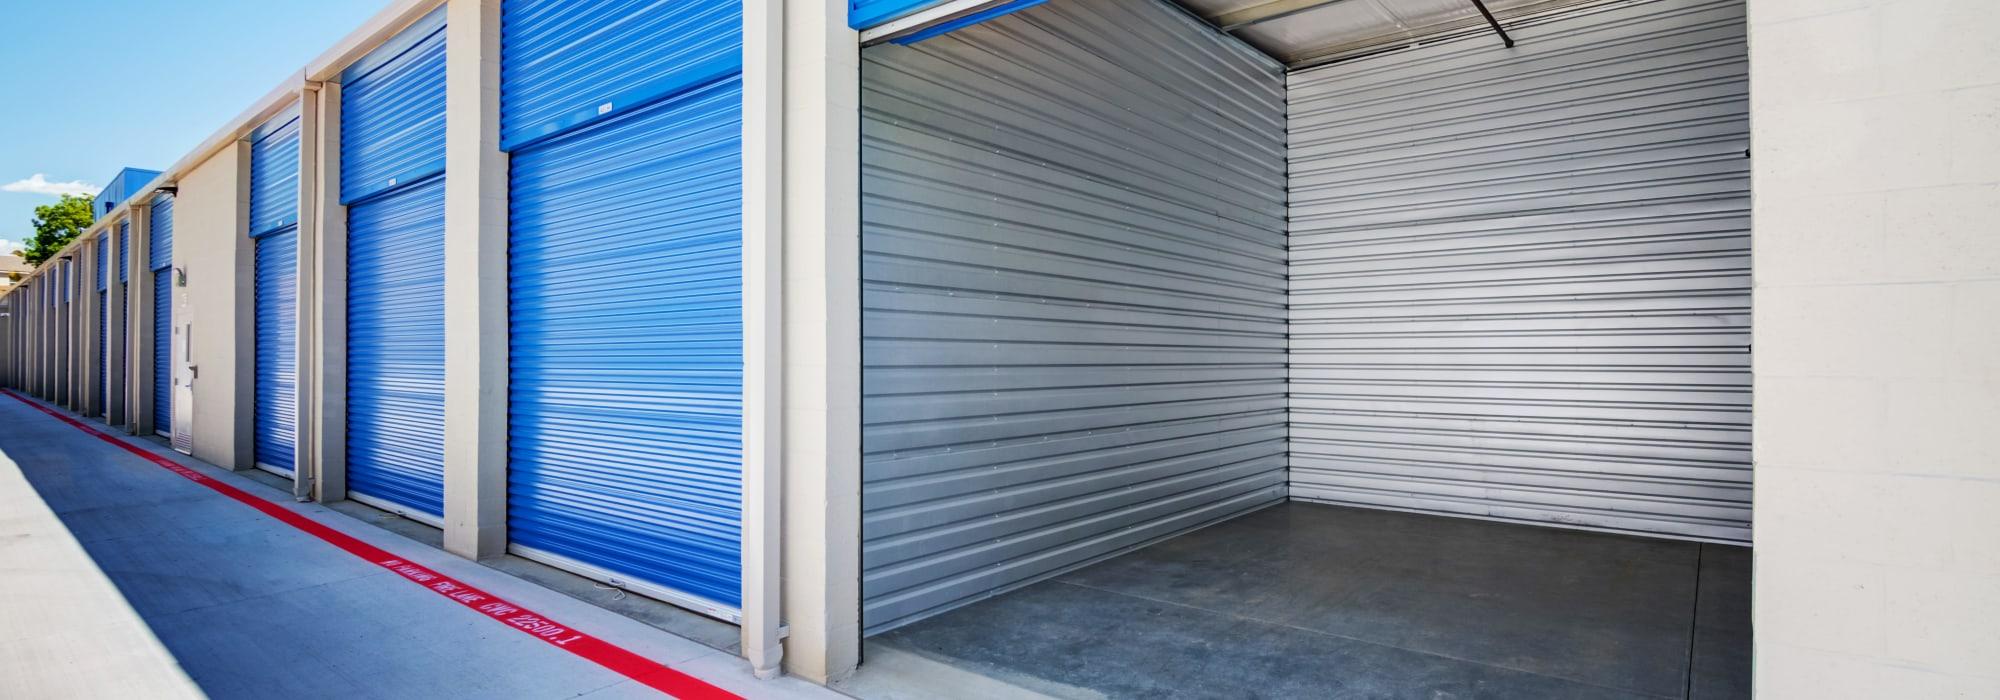 Outdoor units at Silverhawk Self Storage in Murrieta, California